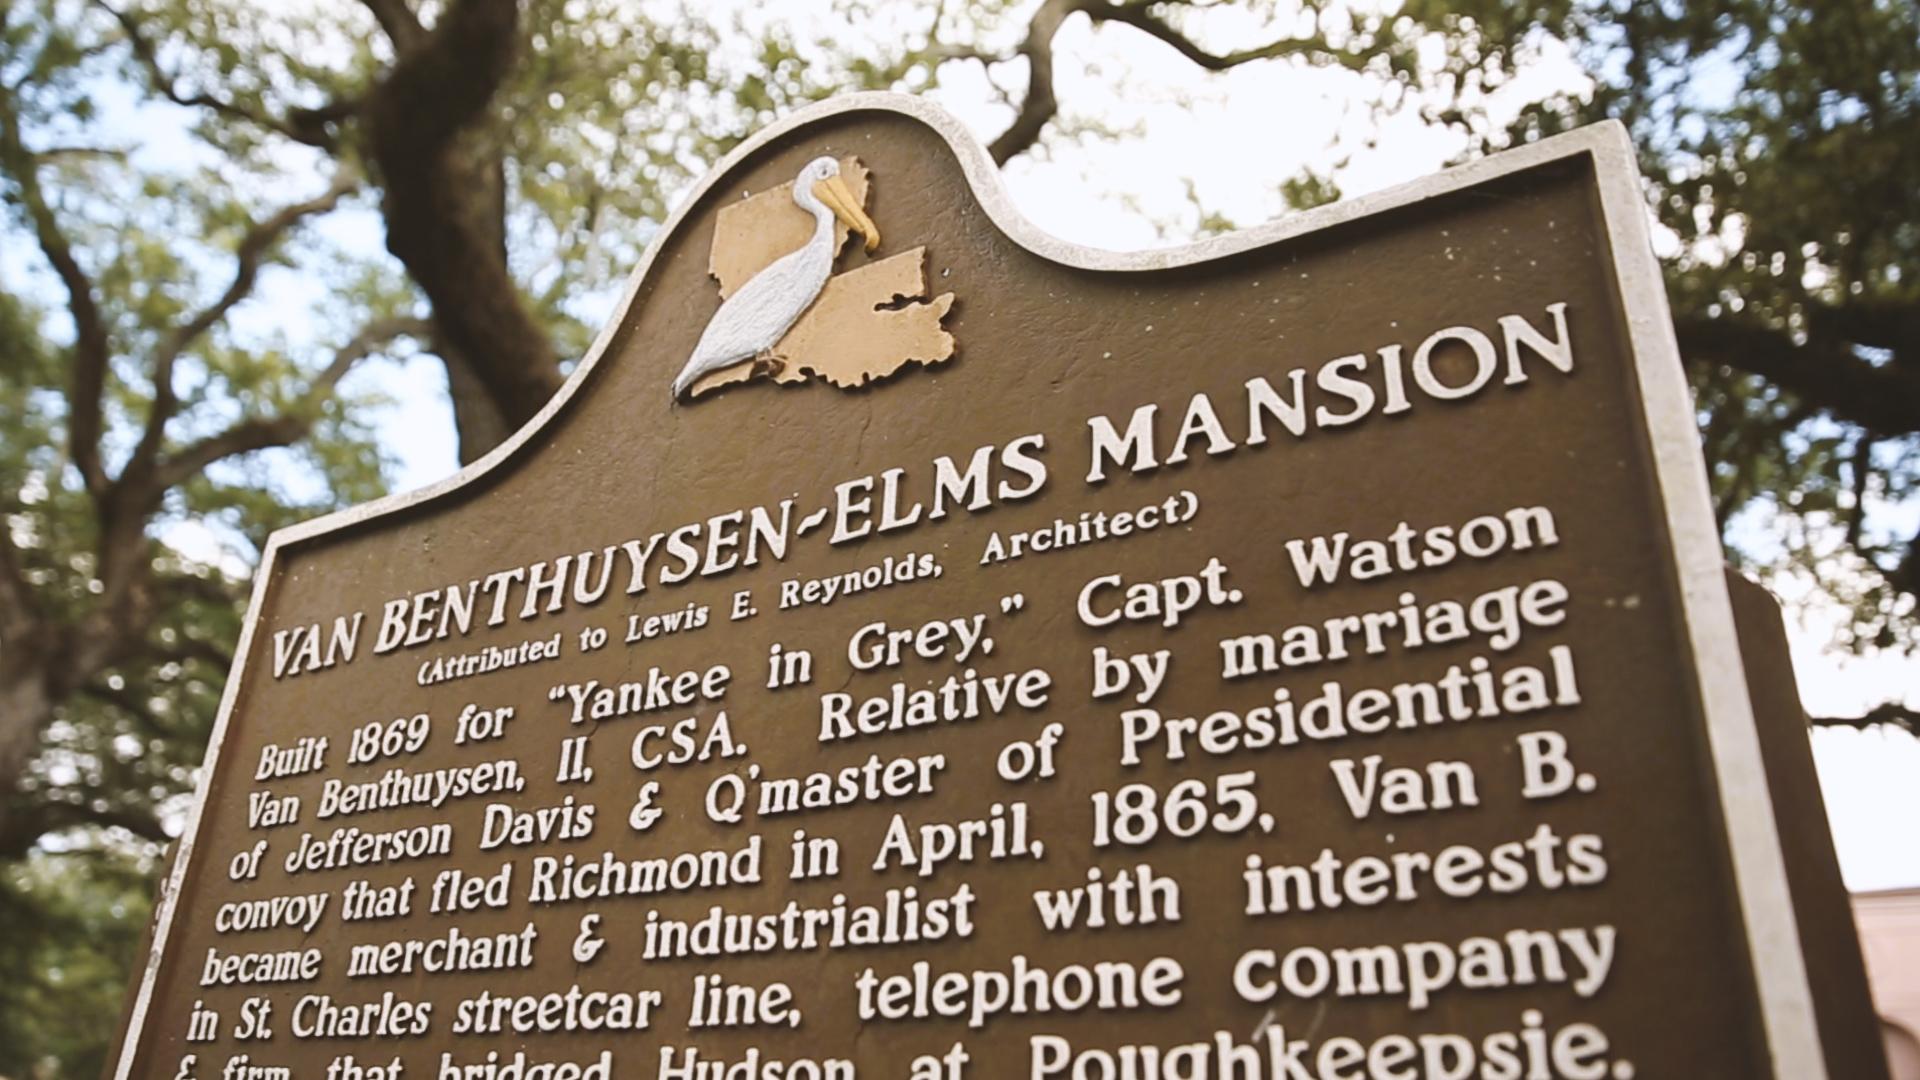 The Elms Mansion - Bride Film